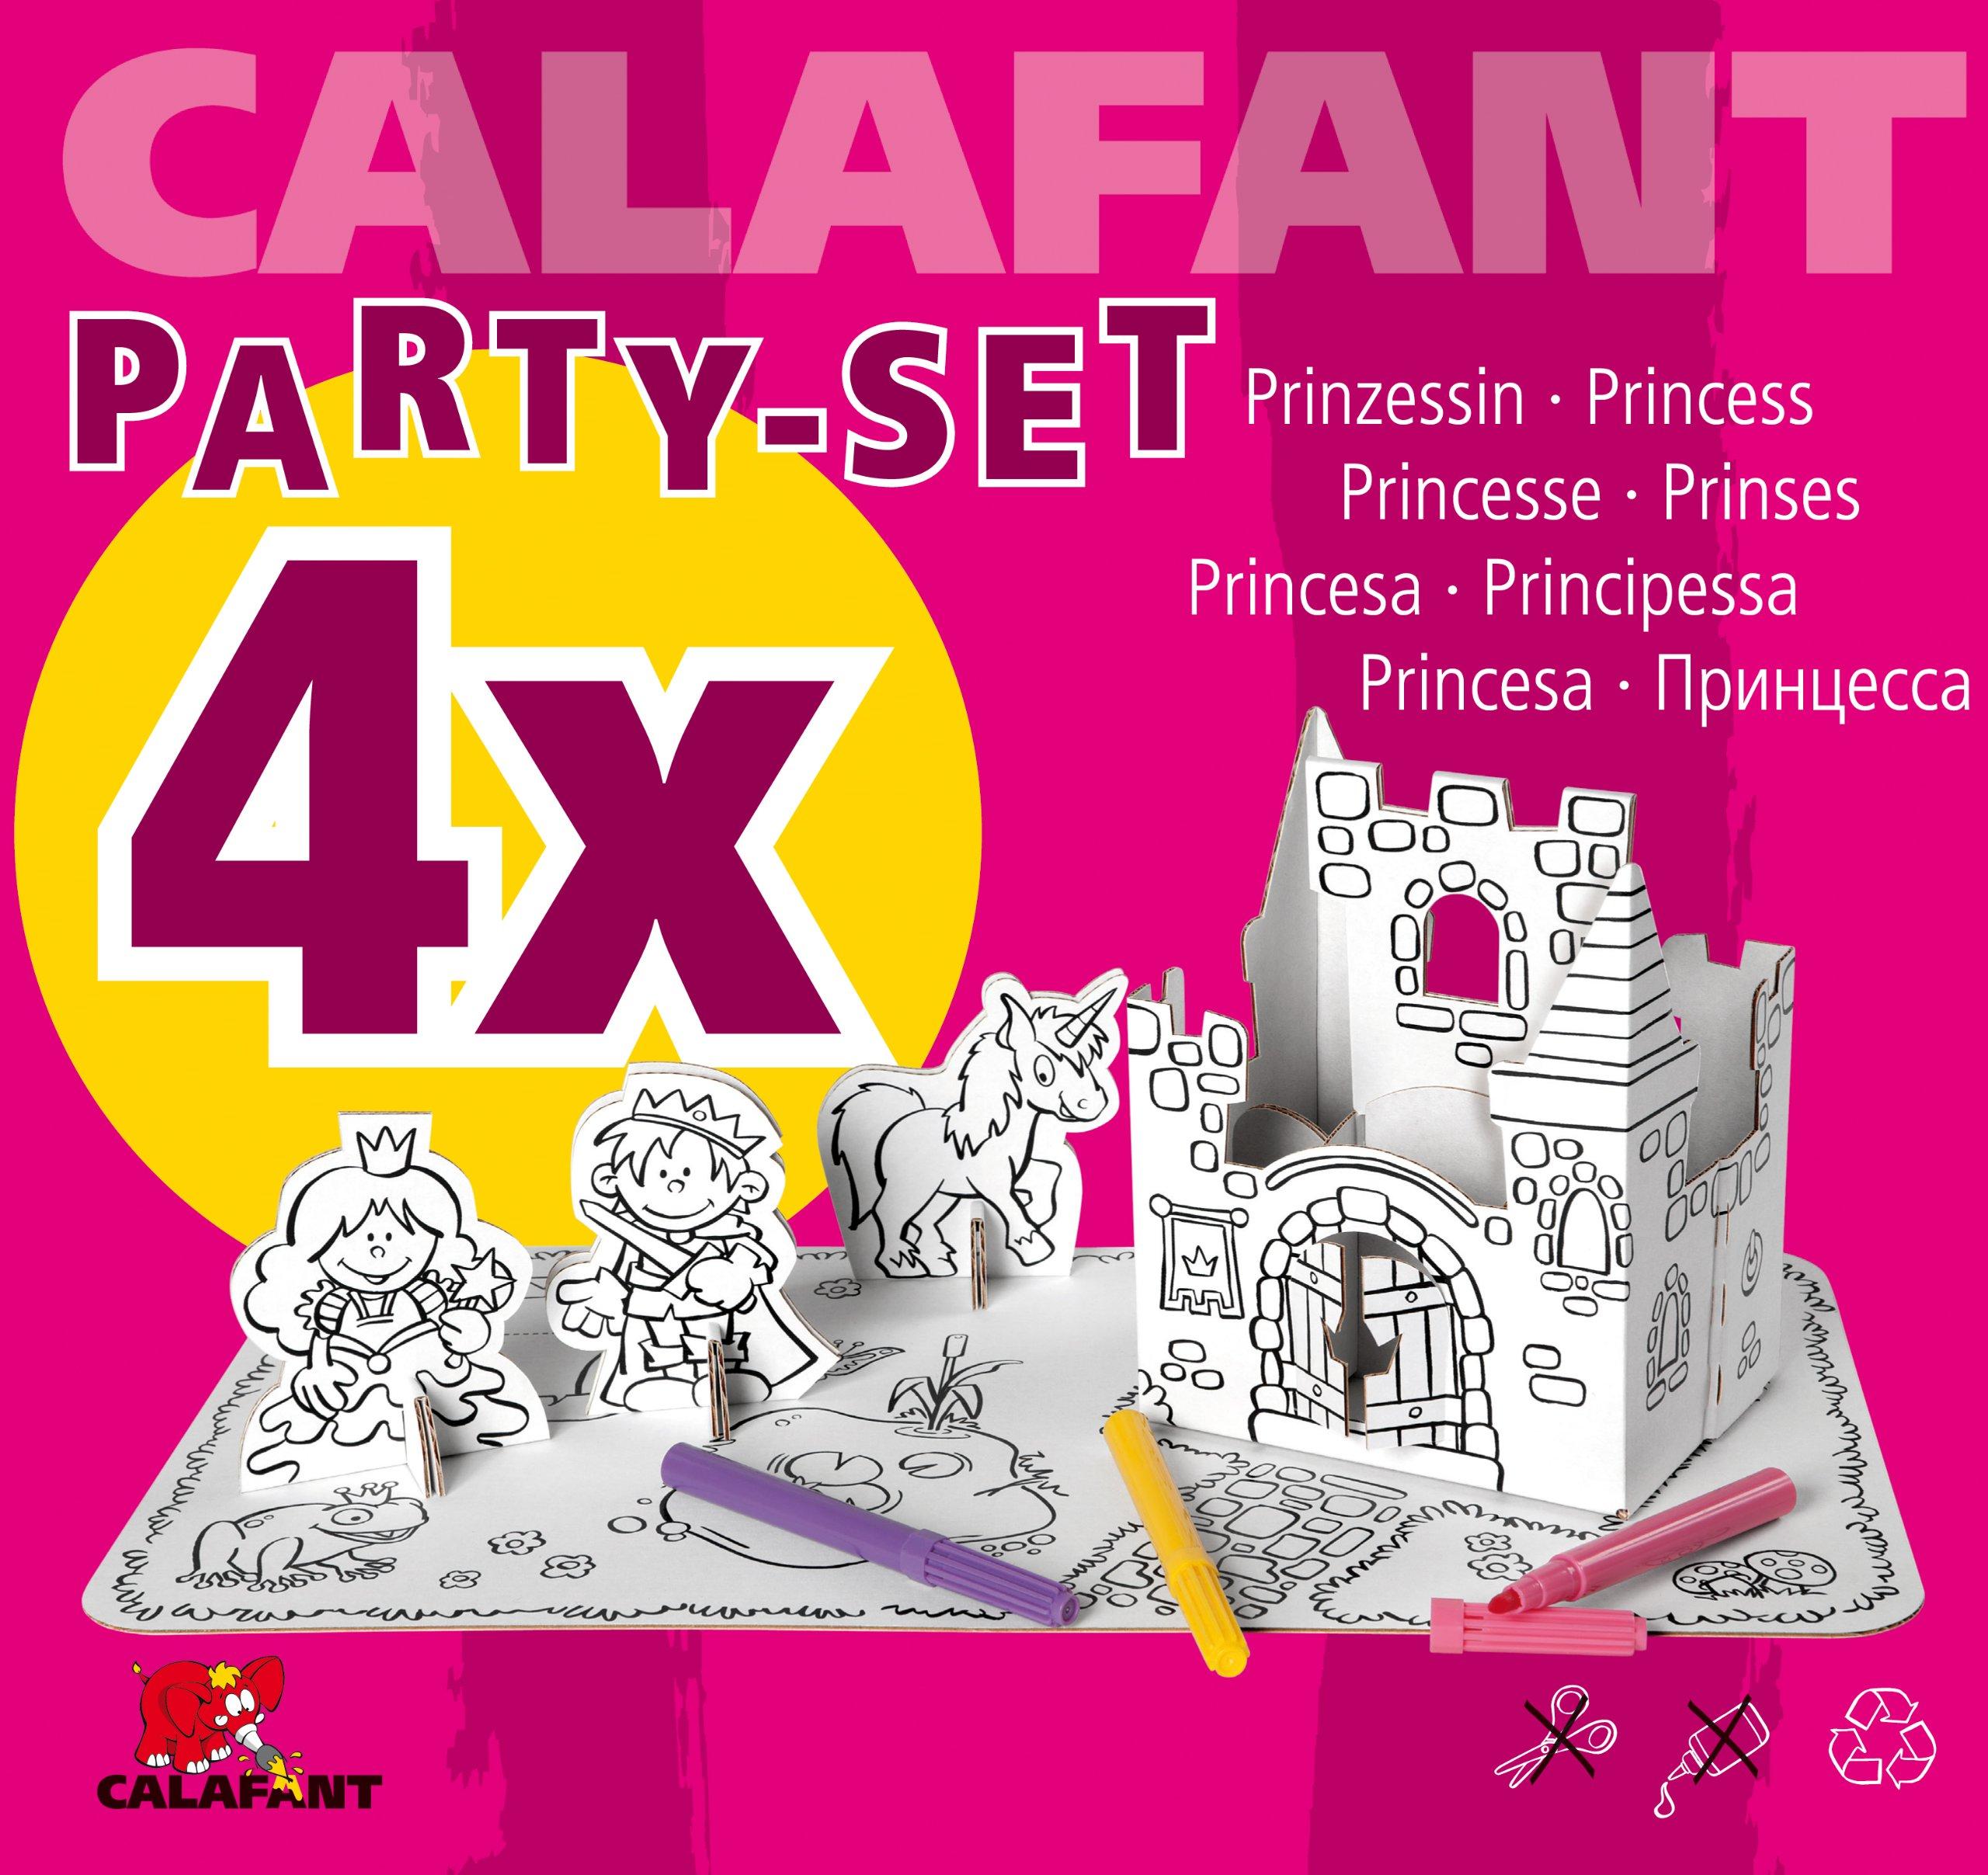 Calafant USA Party Set Princess for 4